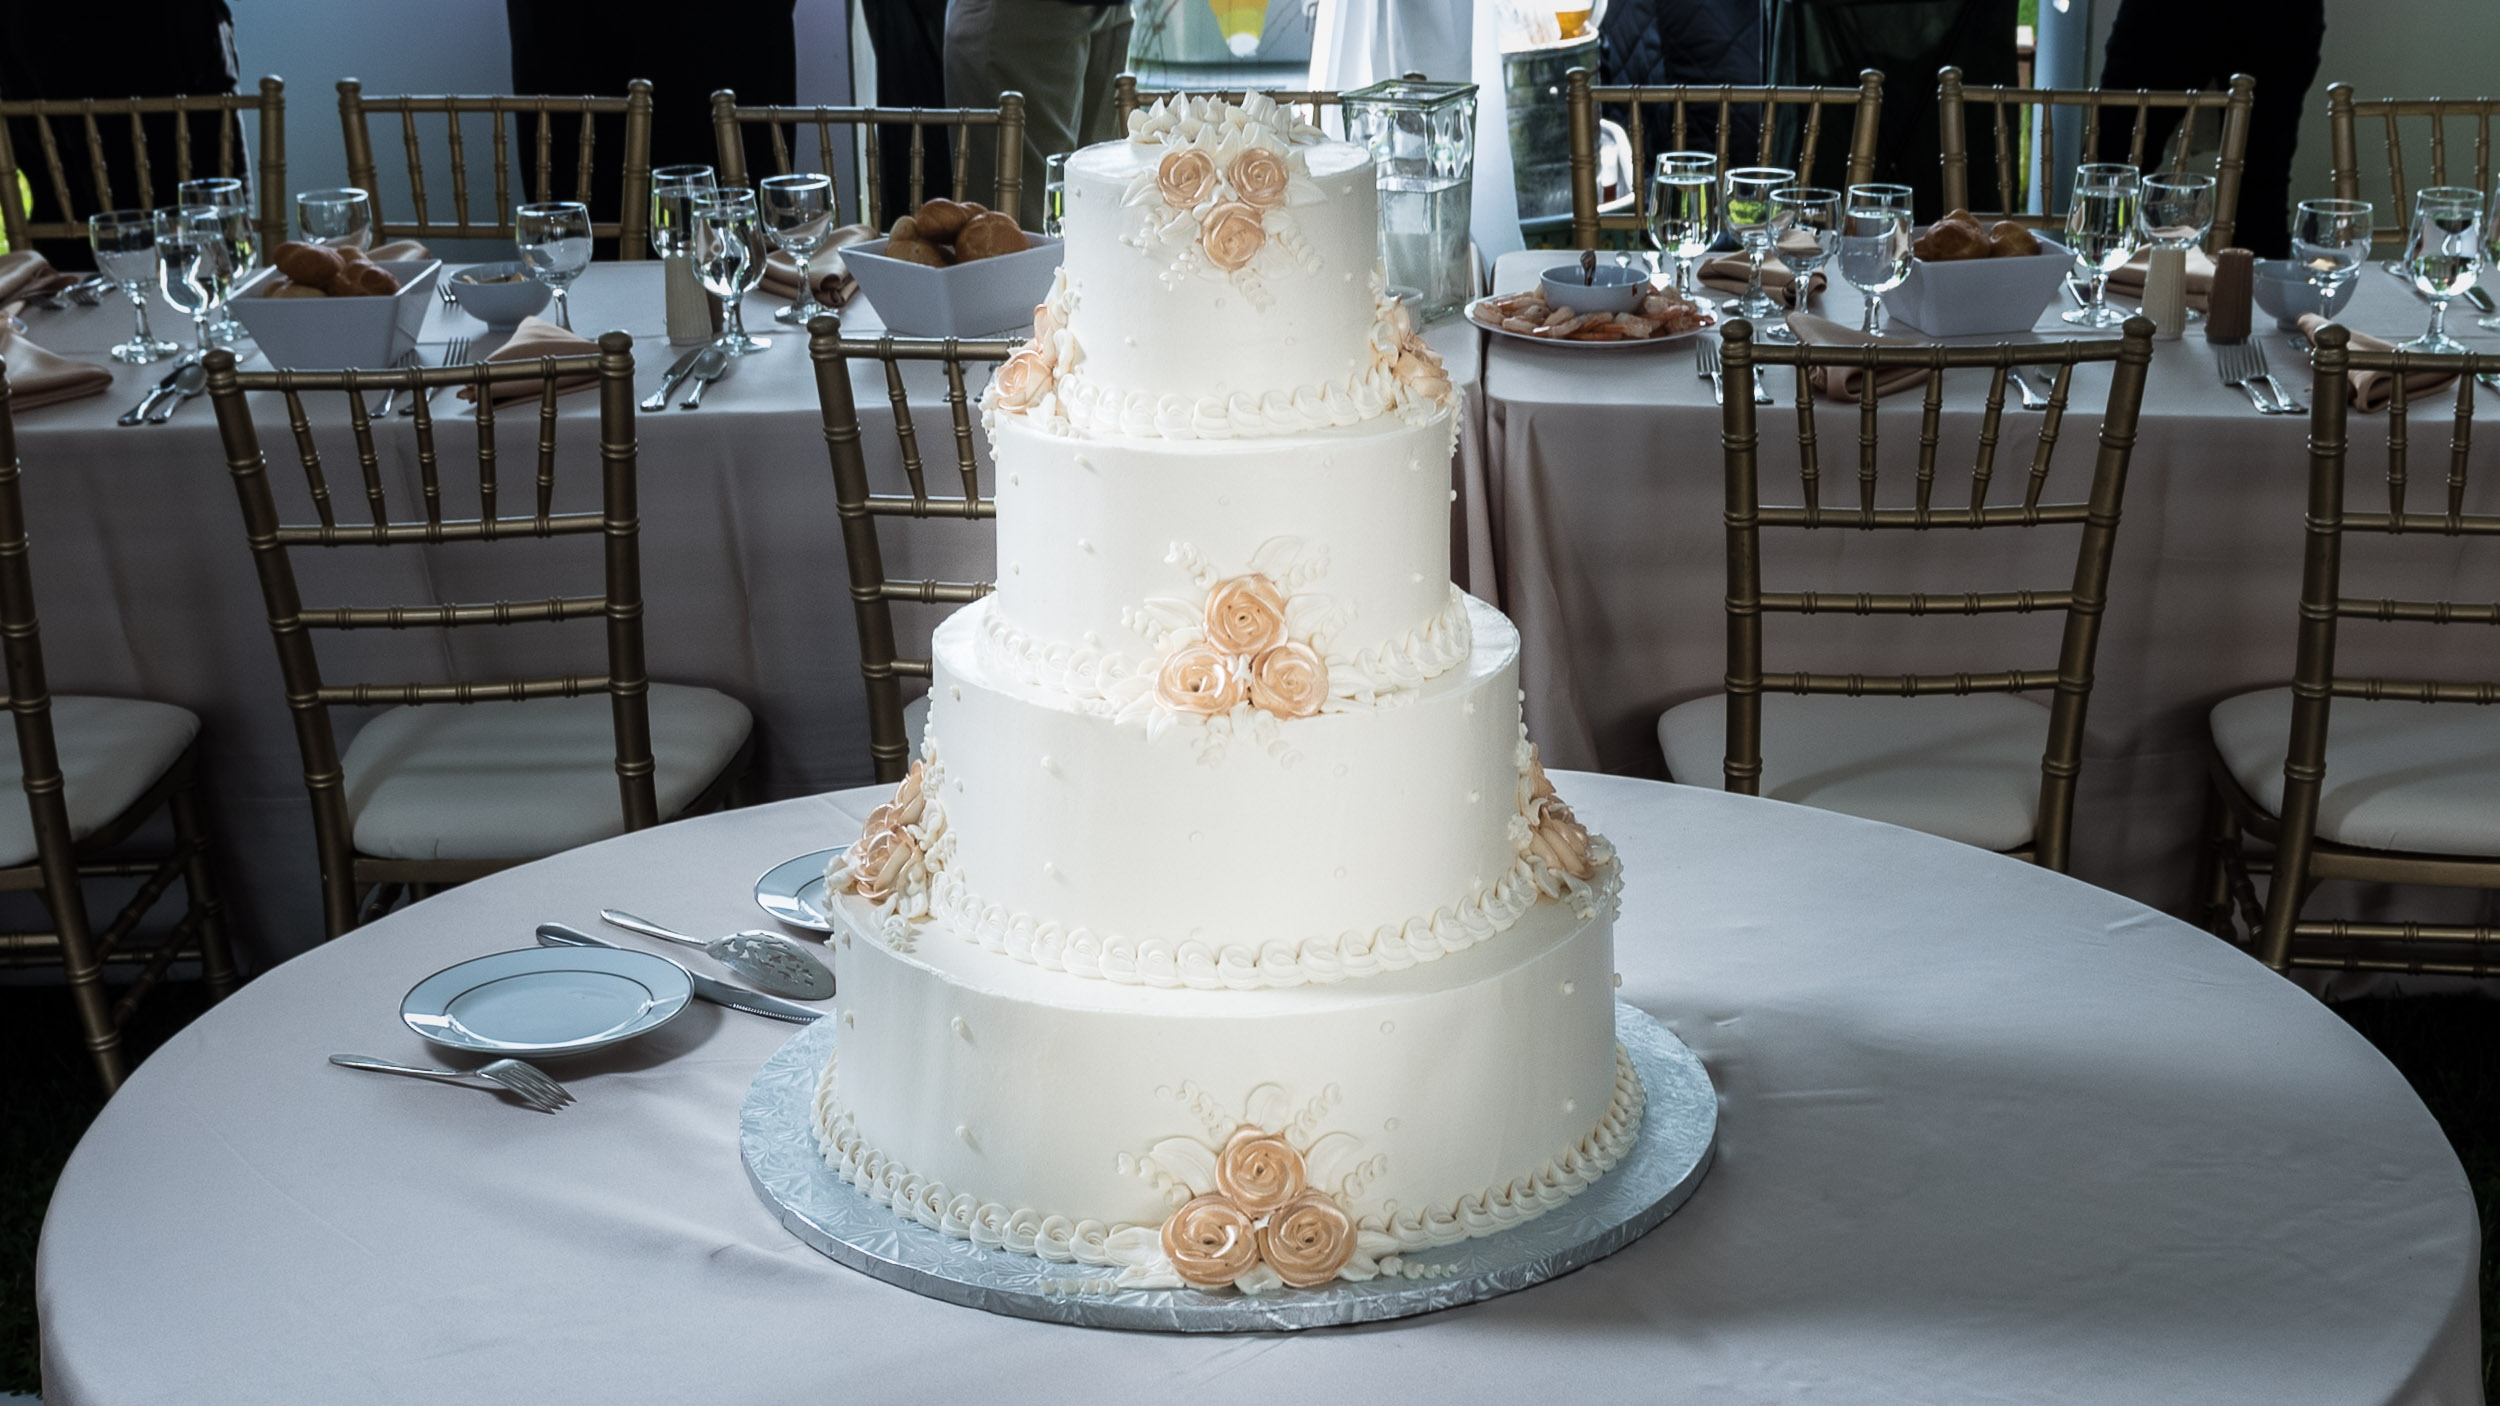 Wedding-cake-at-reception.jpg